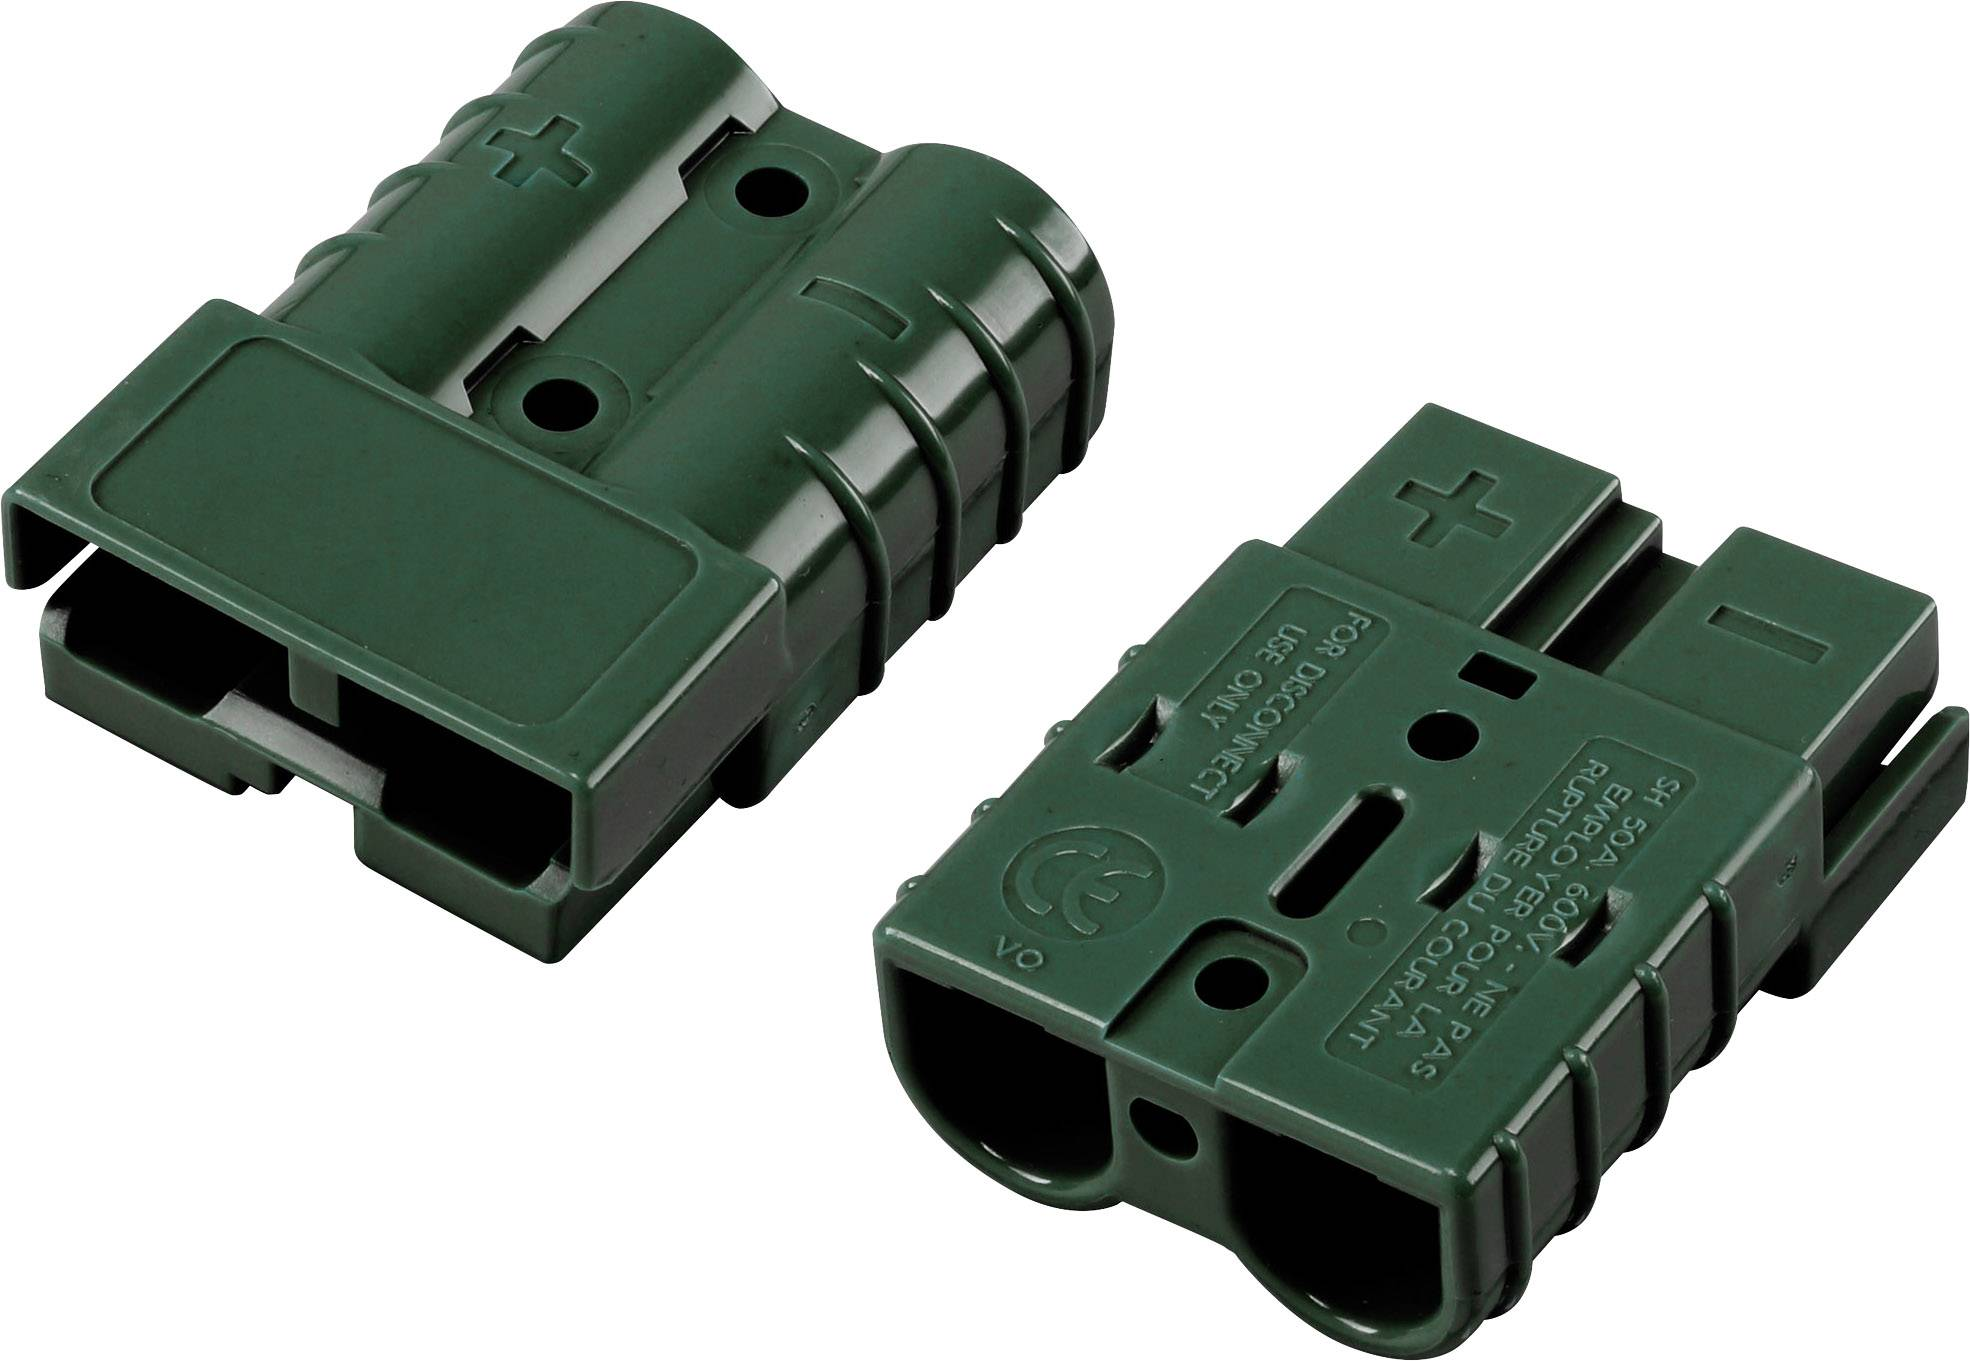 Konektor TRU COMPONENTS 1229368, zelená, 1 ks